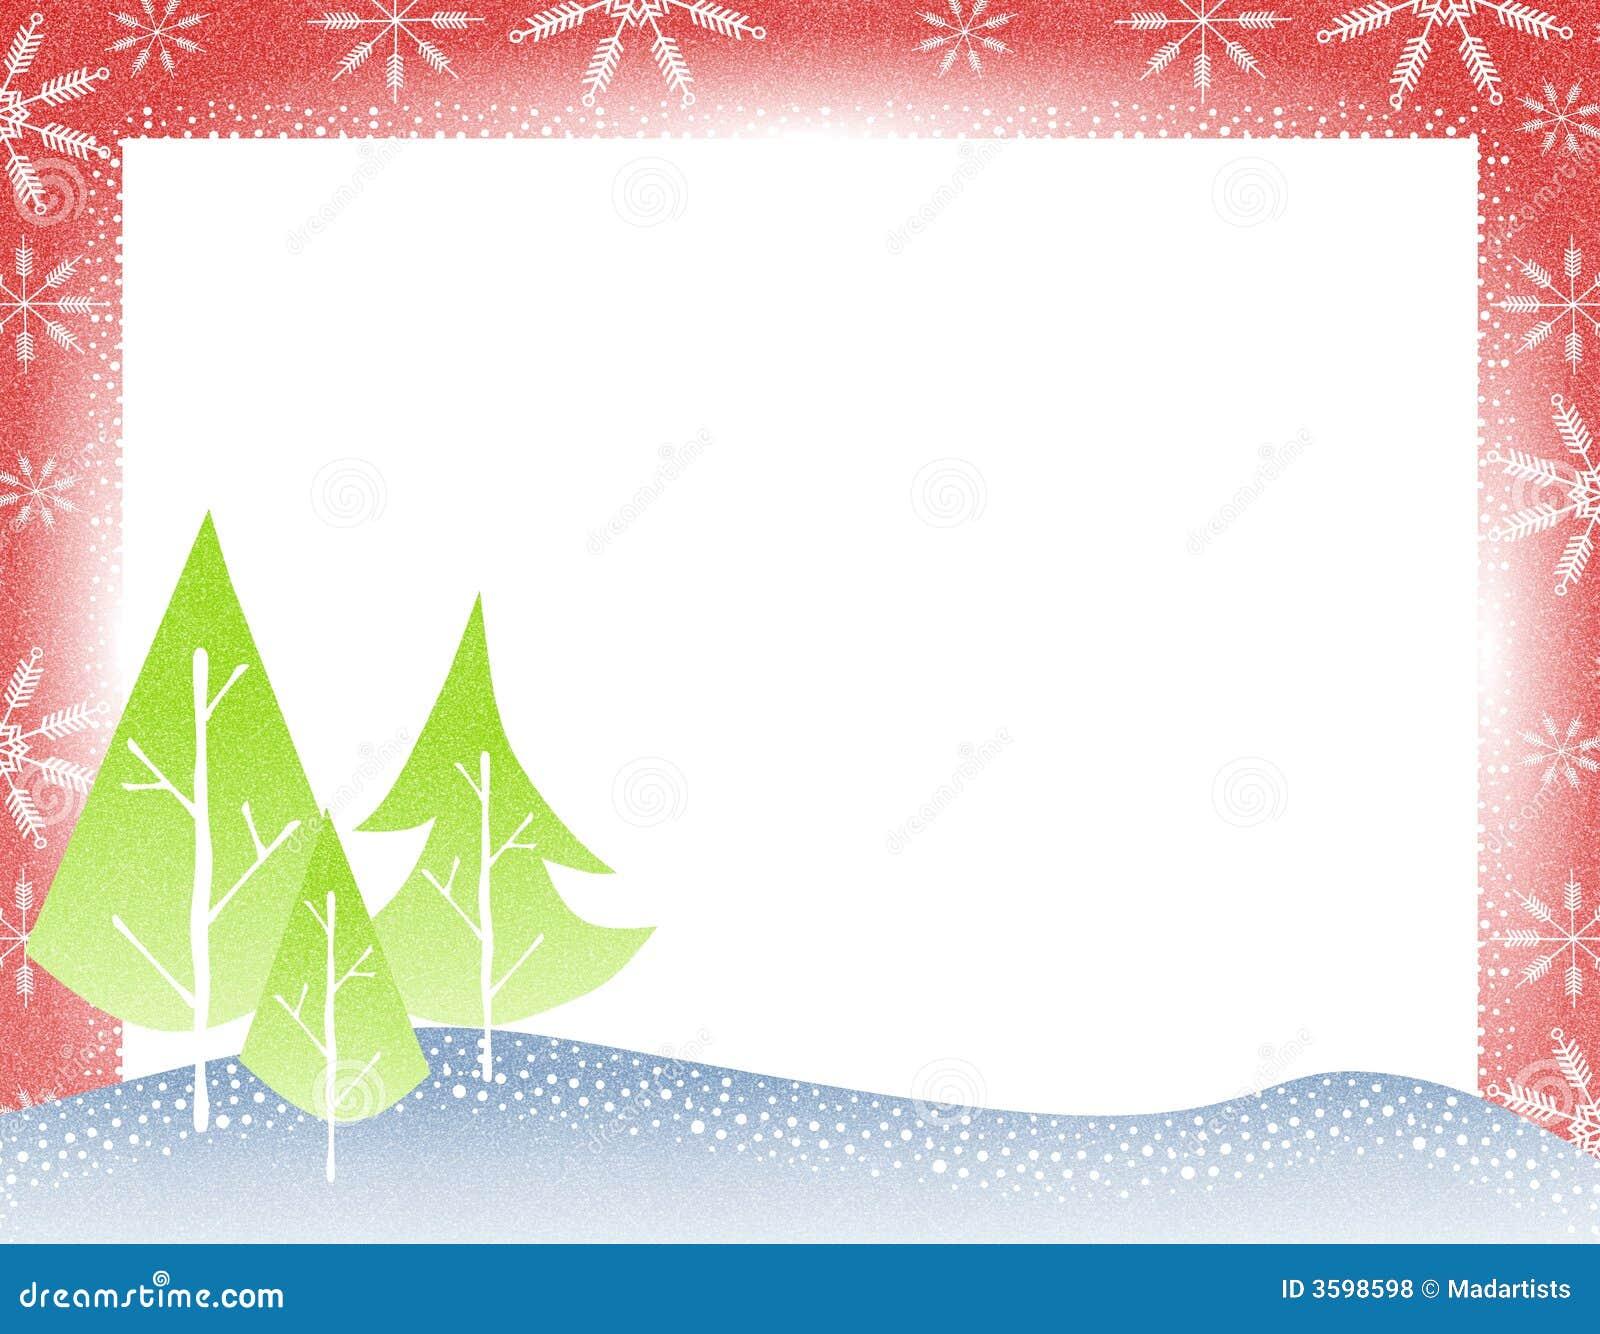 Rustic Christmas Tree Border Royalty Free Stock Photos - Image ...